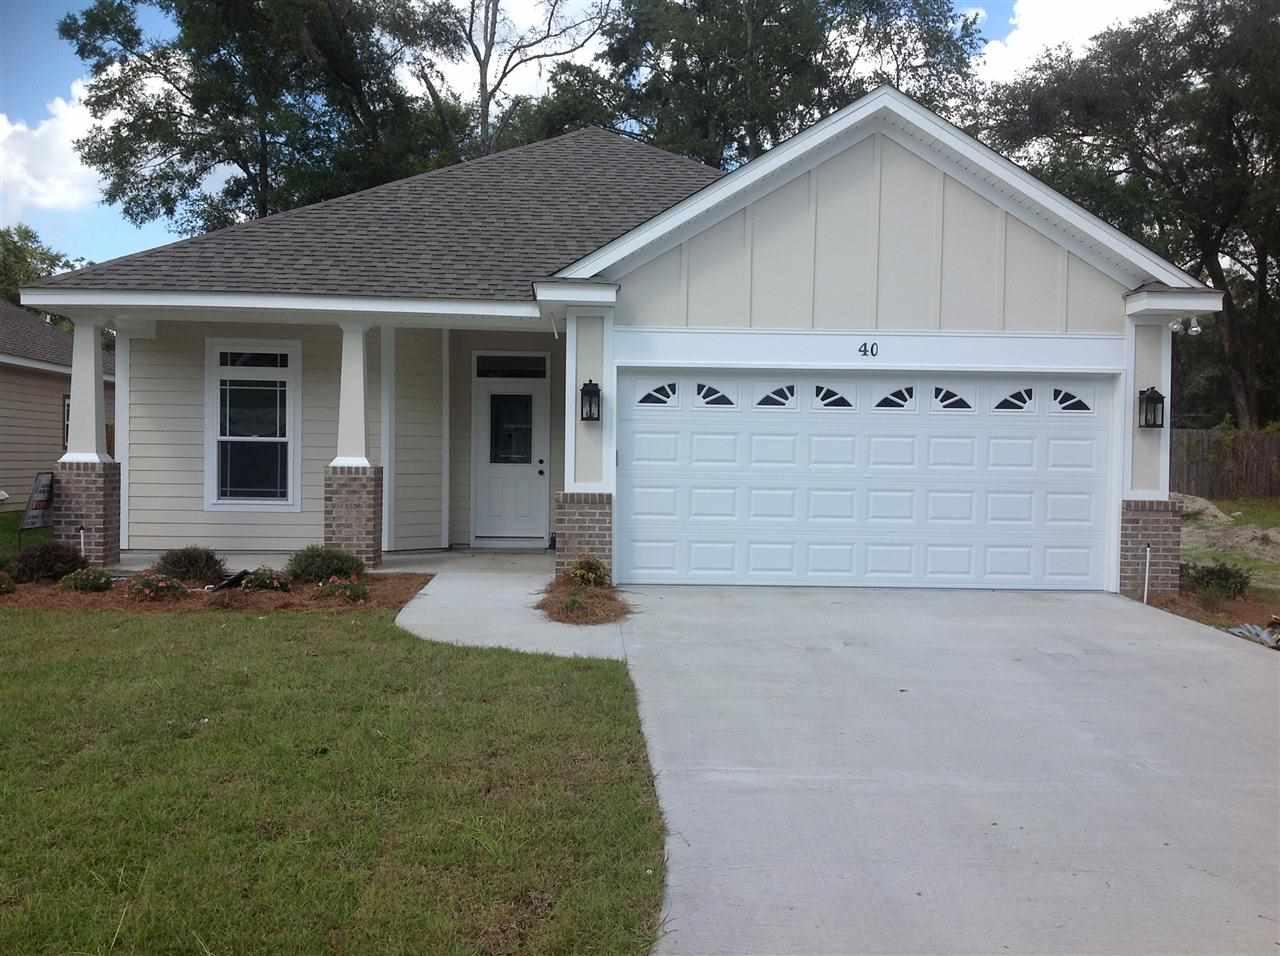 Property ID 287322